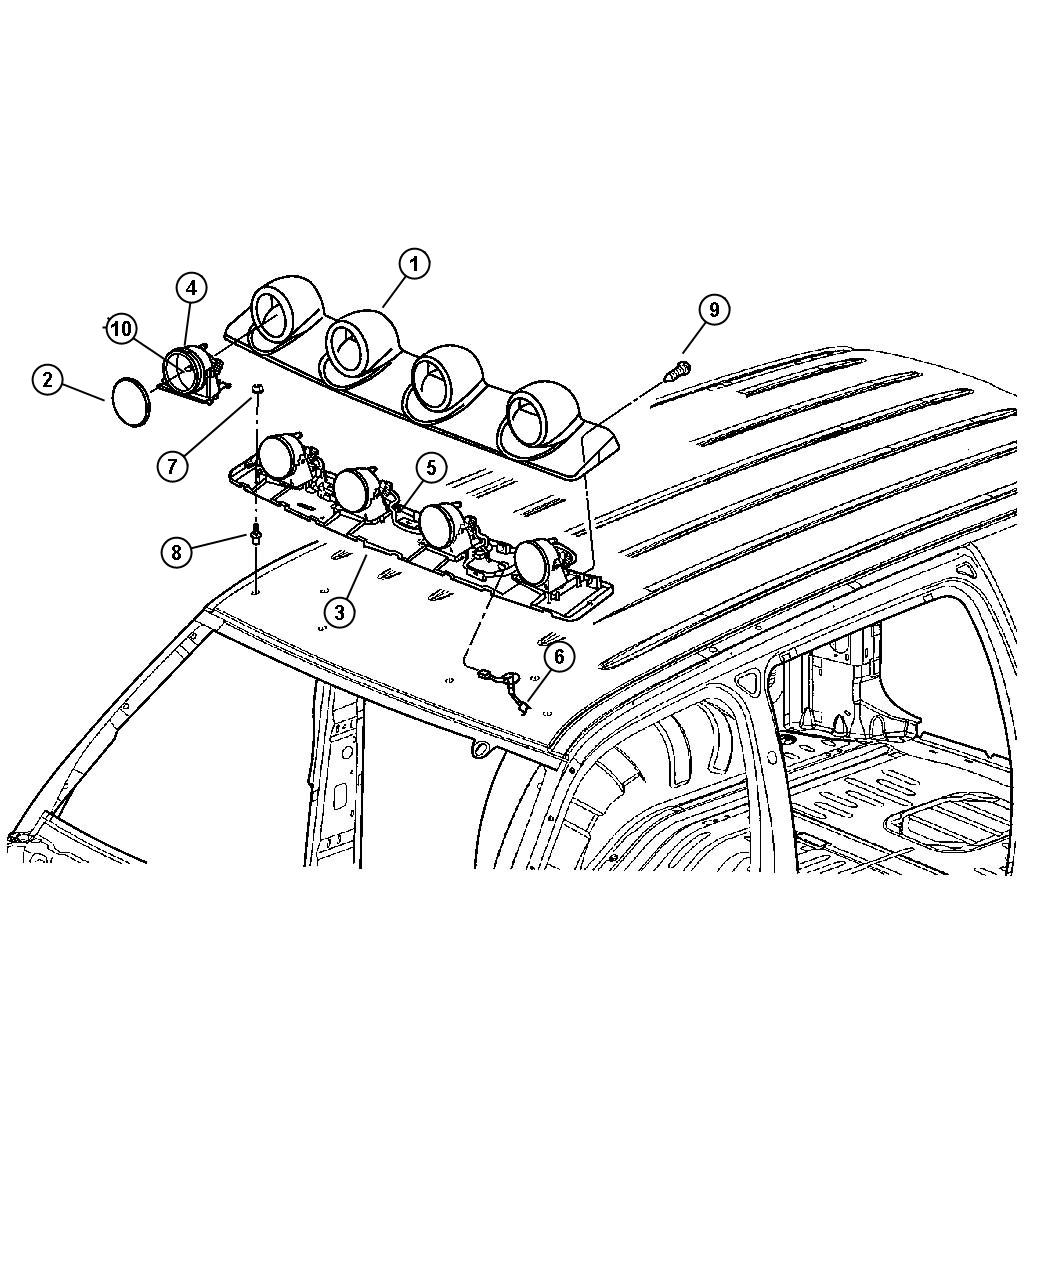 2005 jeep liberty renegade wiring diagram